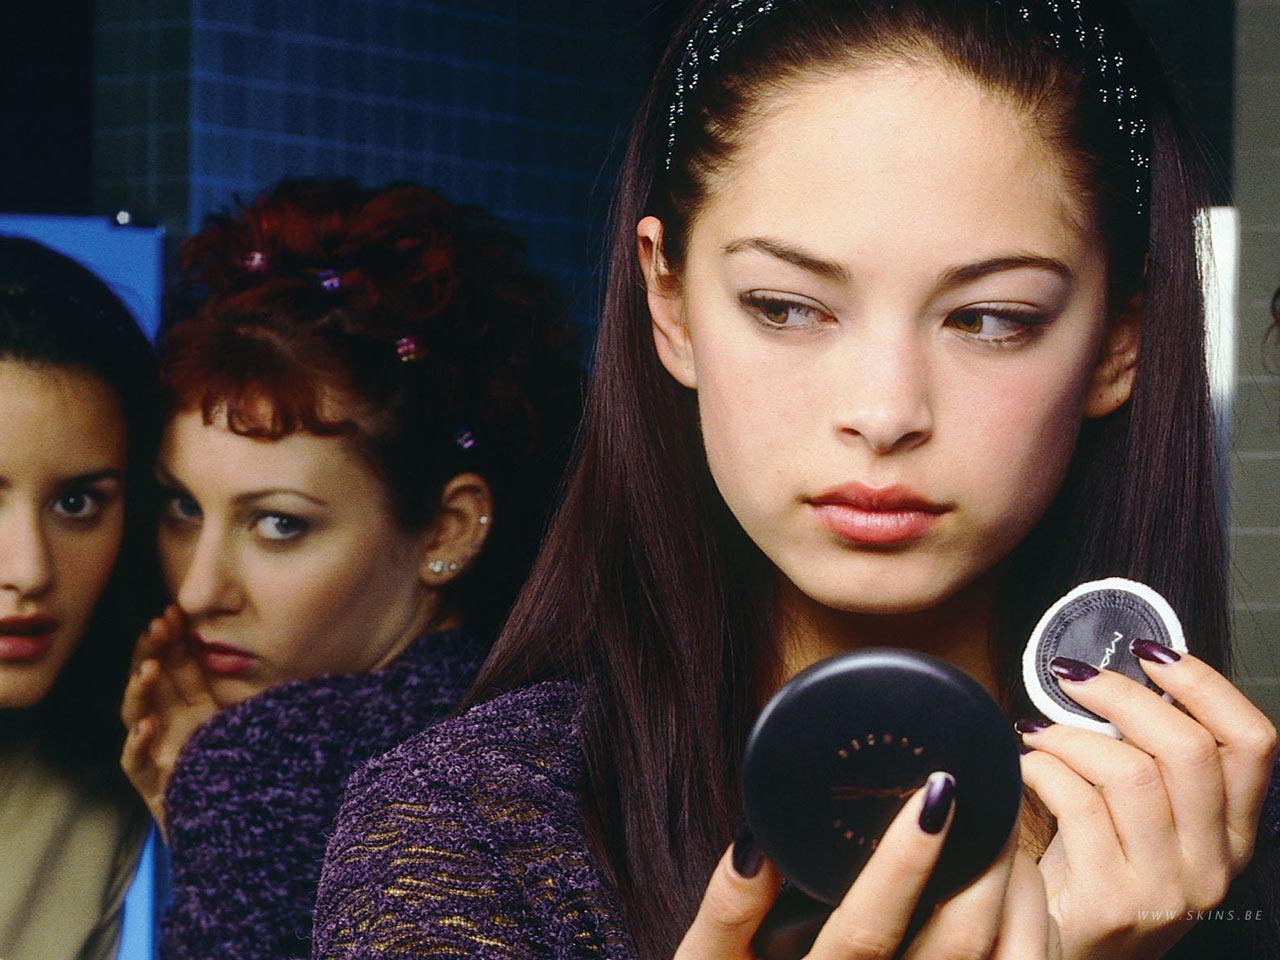 Wallpaper Kristin Kreuk Lana maquillage